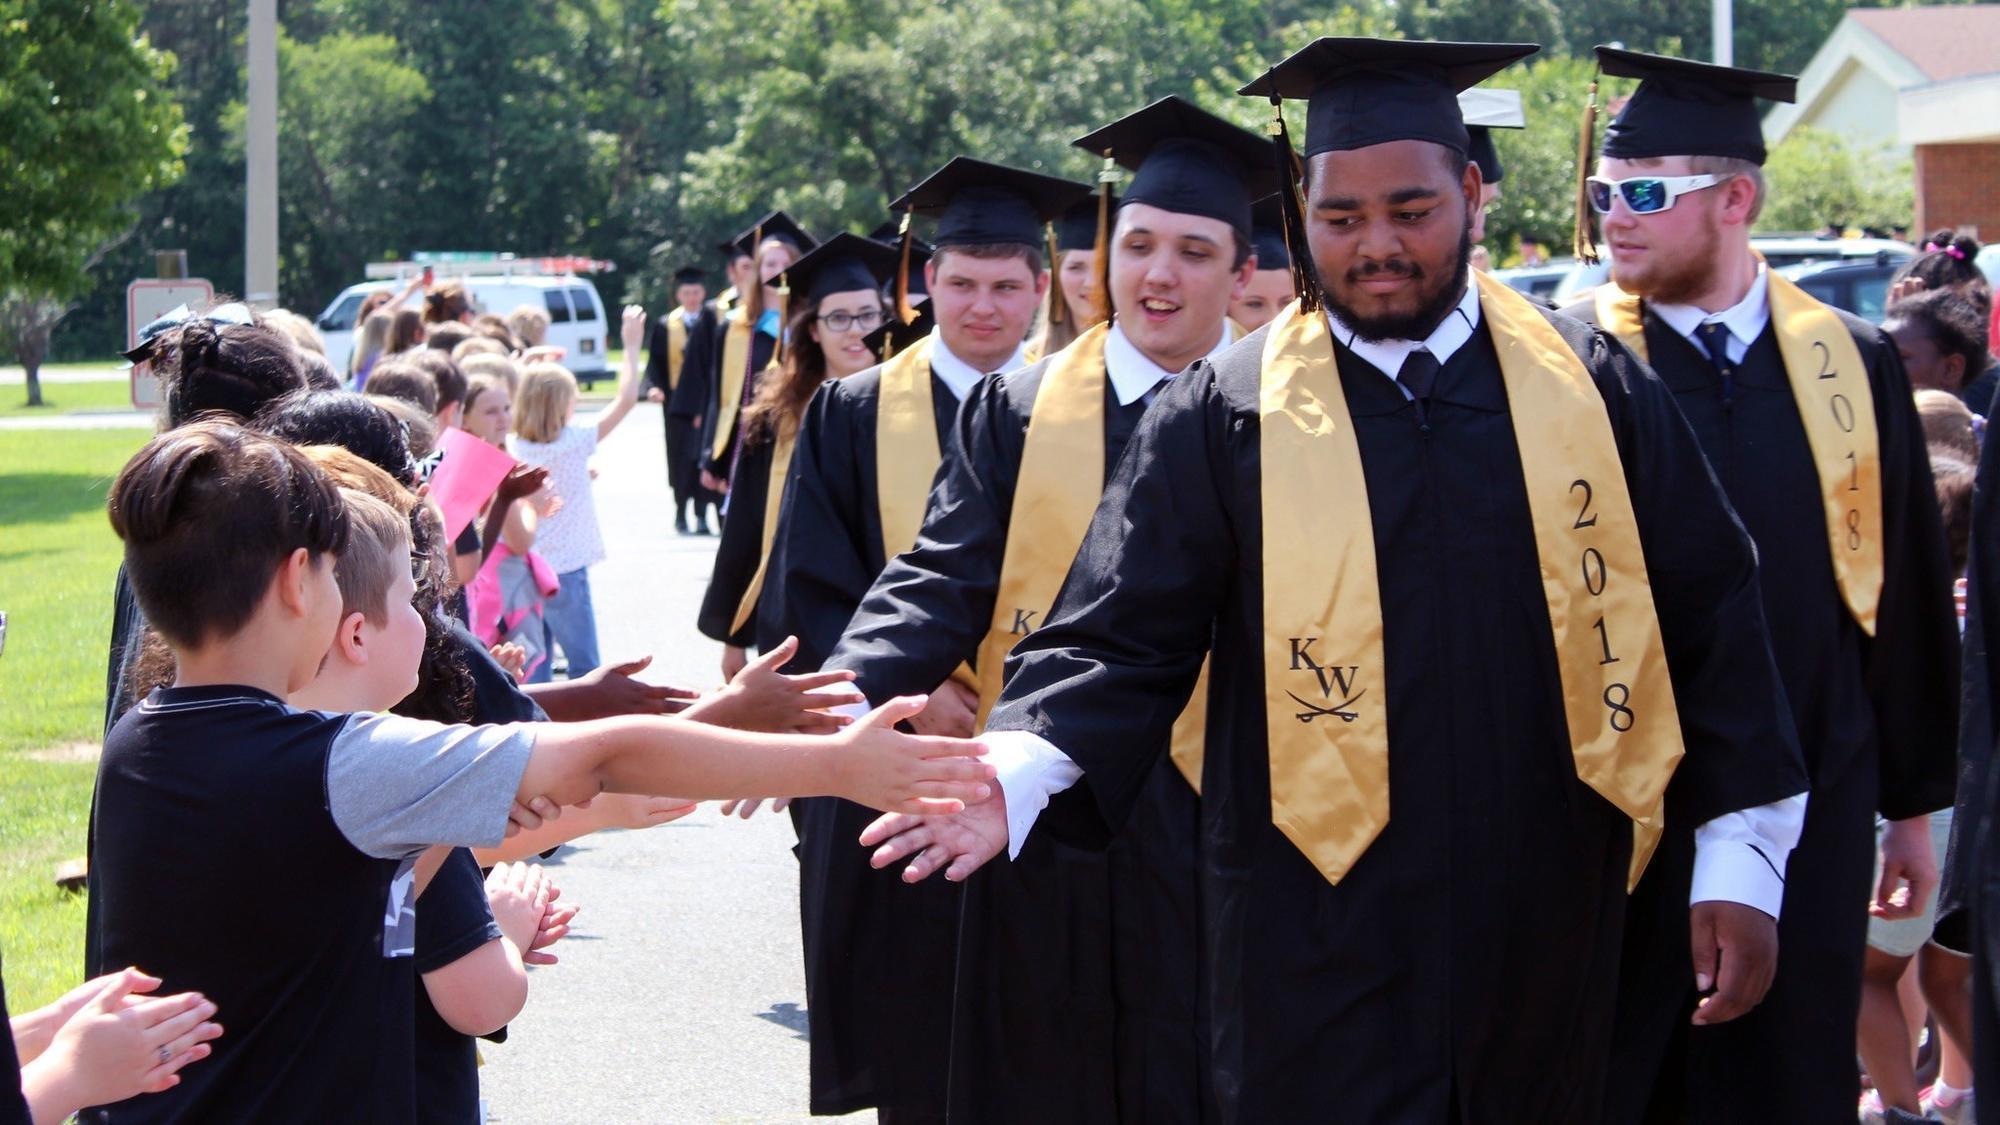 89ff0ee8eb0 King William Public Schools celebrate 2018 graduates - The Virginia Gazette